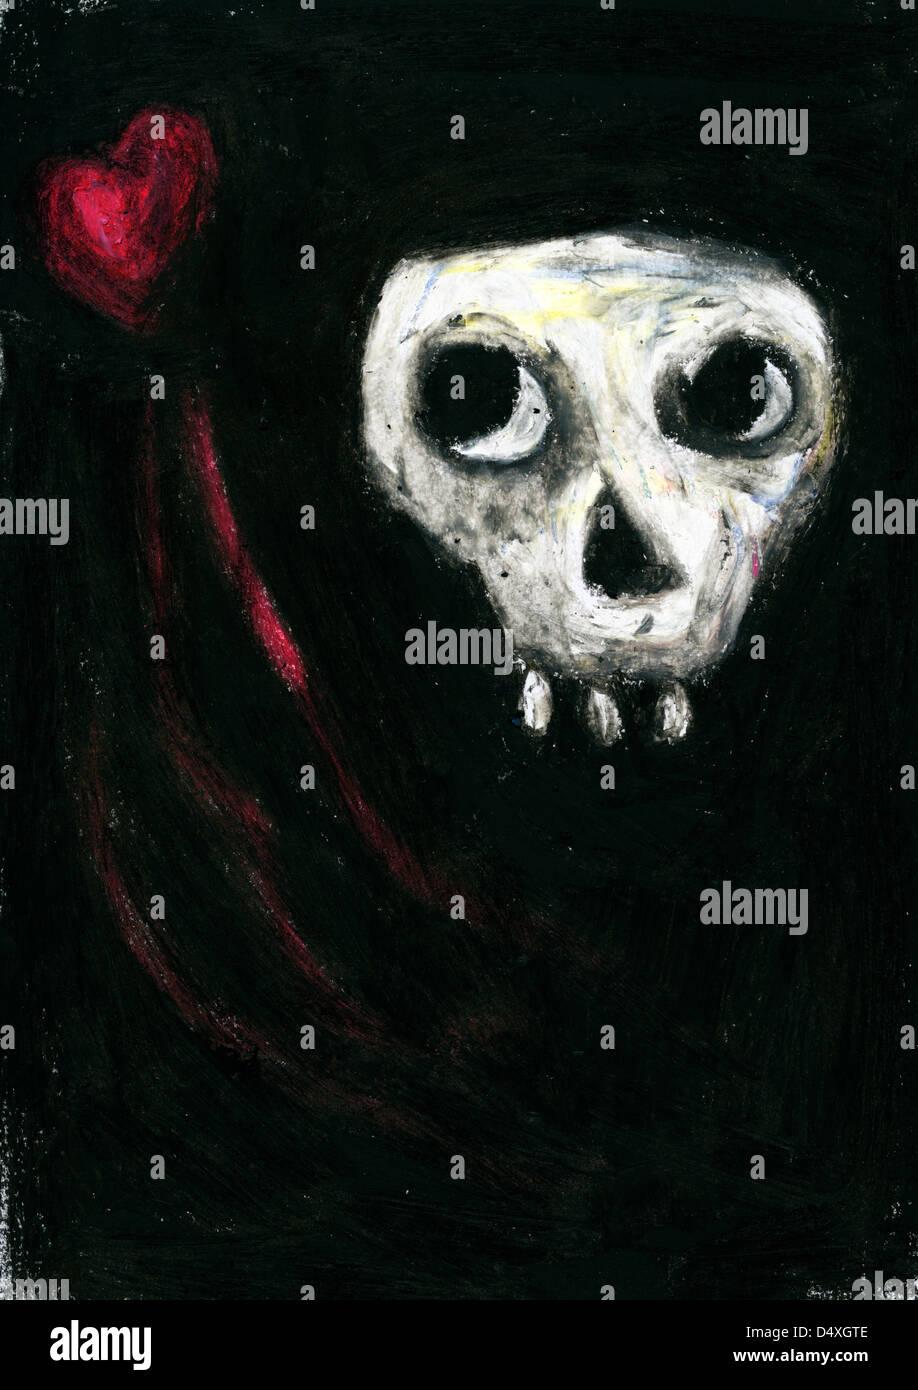 Skull looking sideways at heart - Stock Image